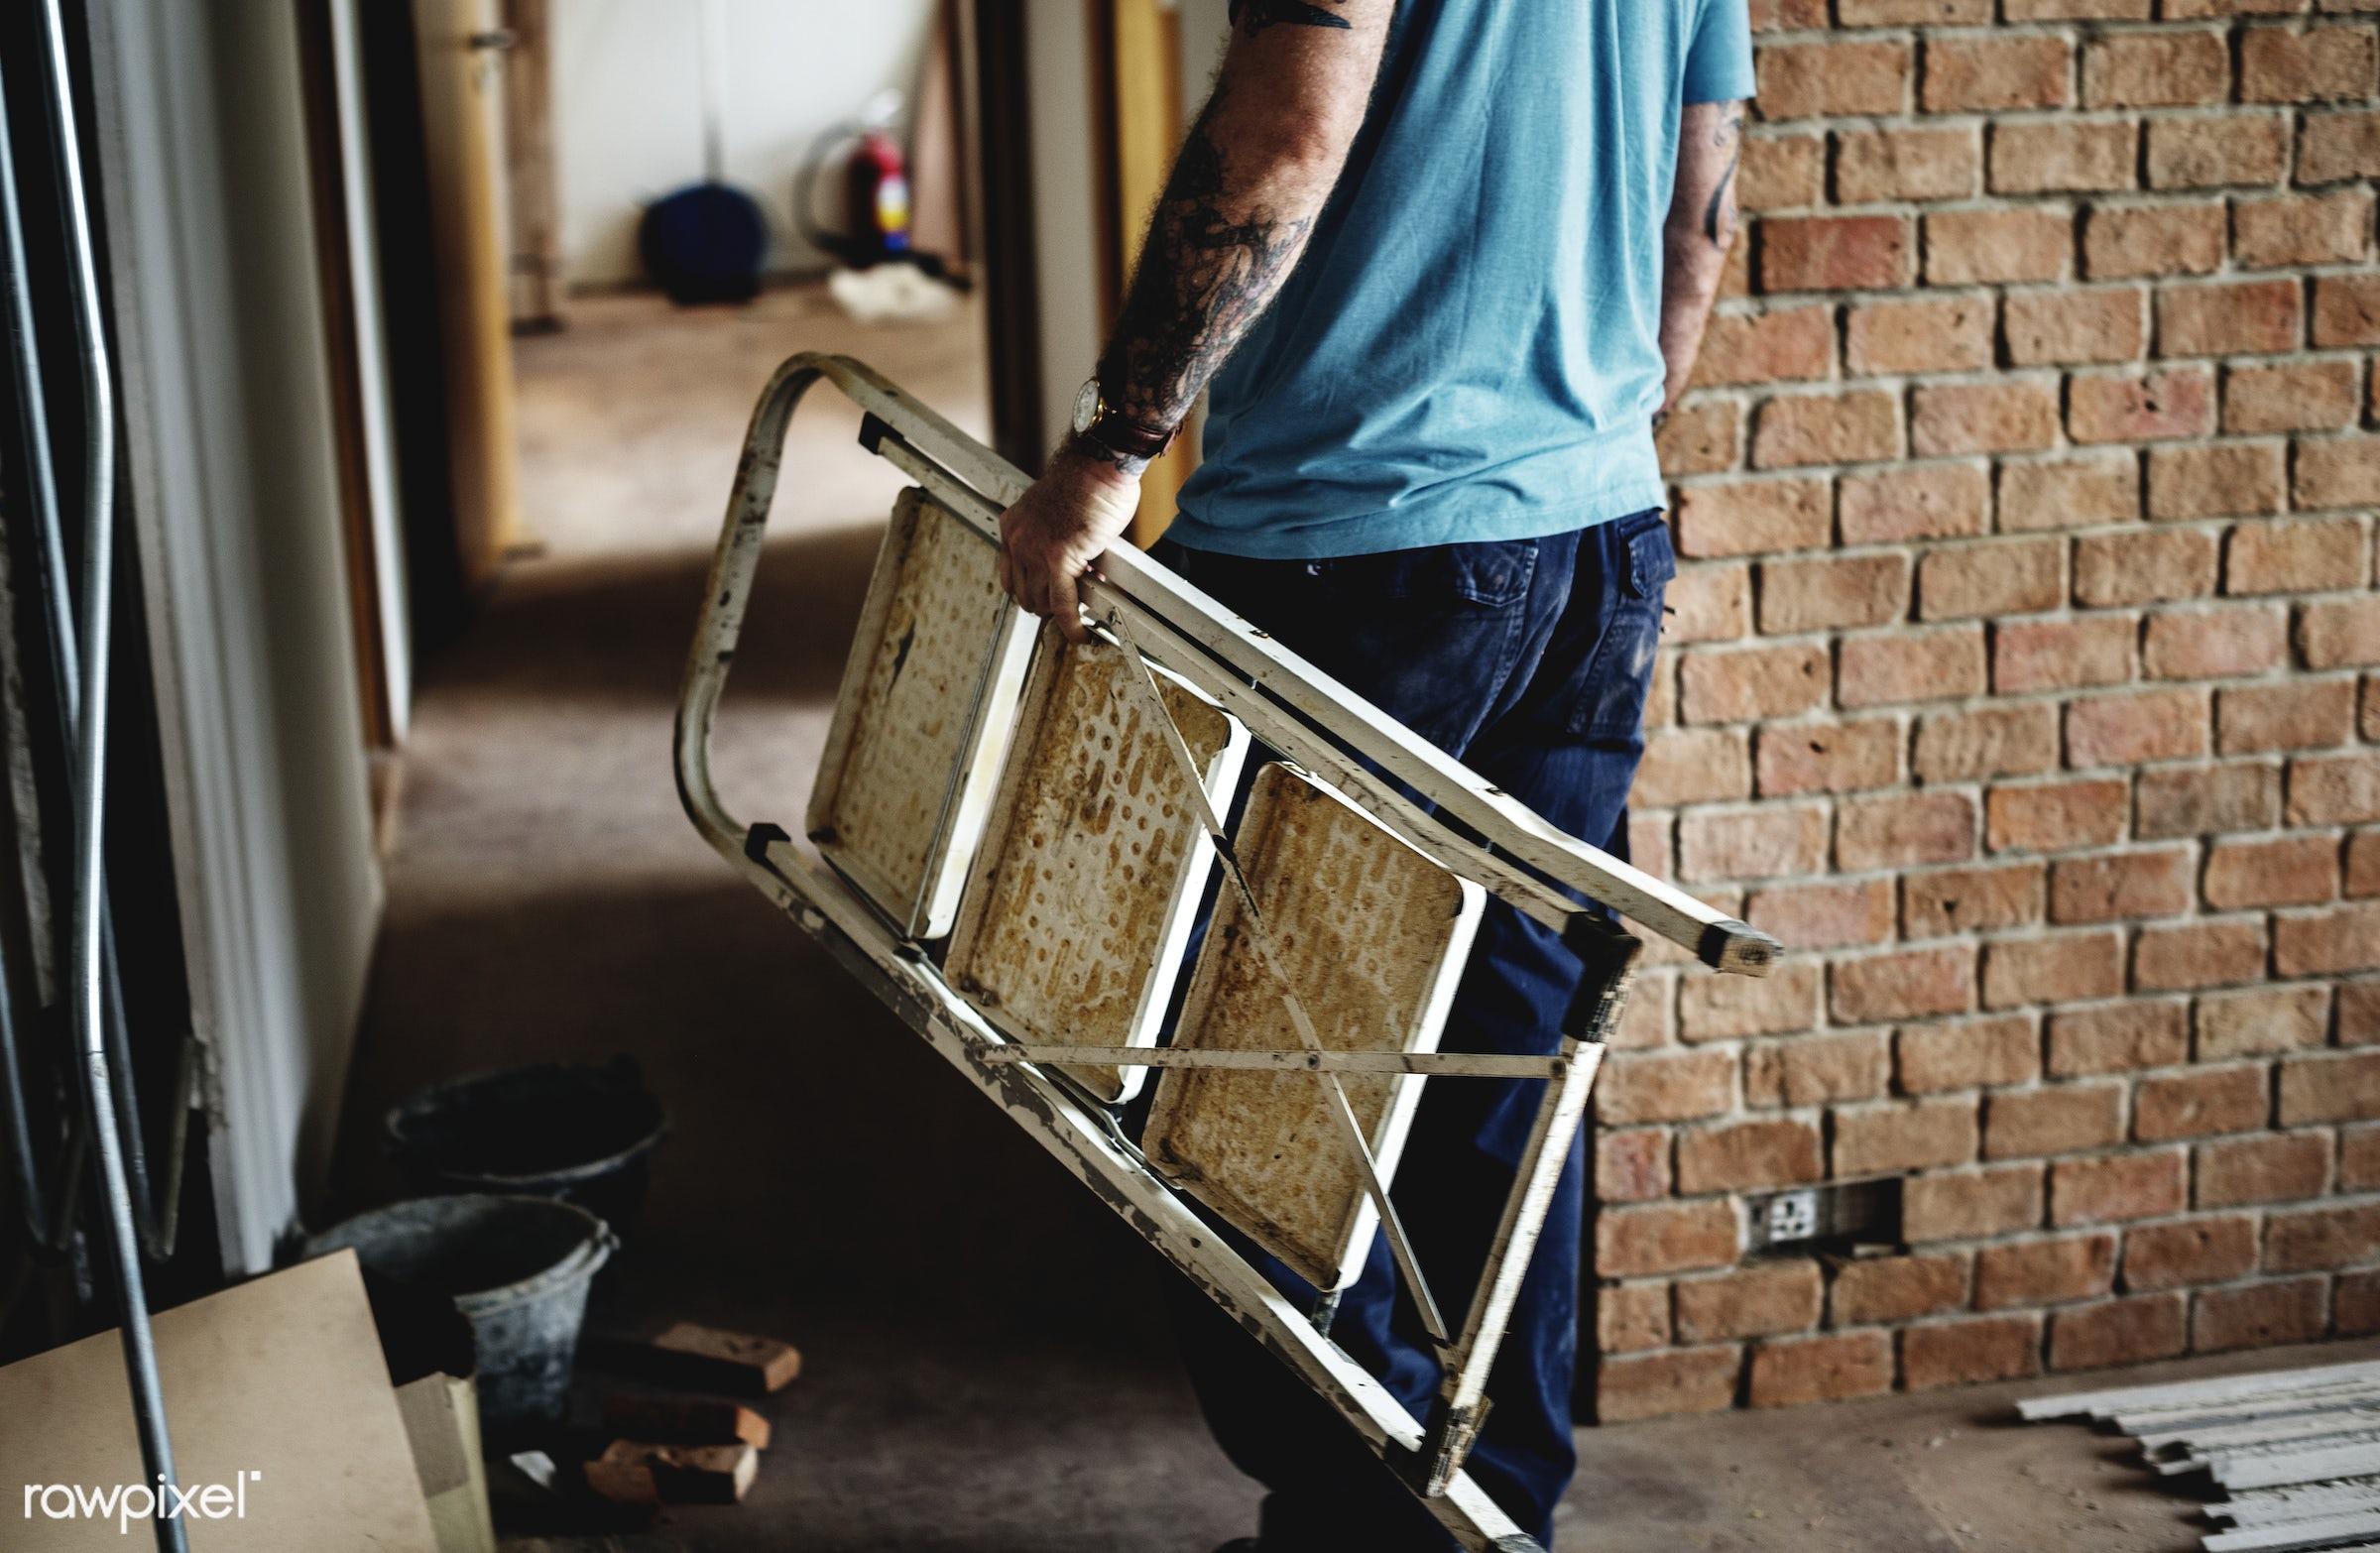 Construction worker carrying a steel ladder - ladder, renovating, brick, builder, equipment, build, tools, materials,...